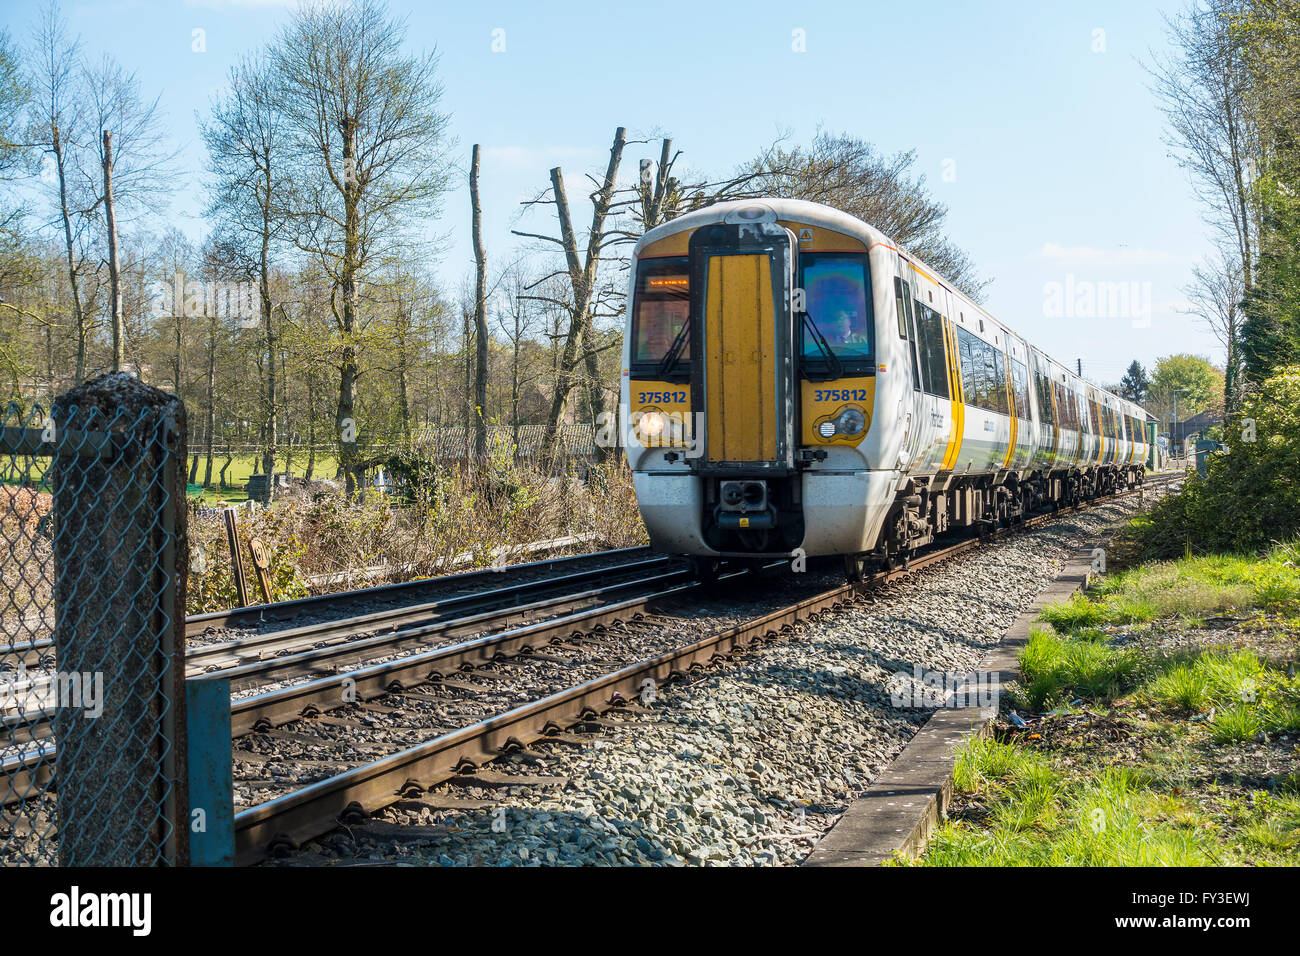 British Rail Fast Passenger Train SouthEastern Kent - Stock Image